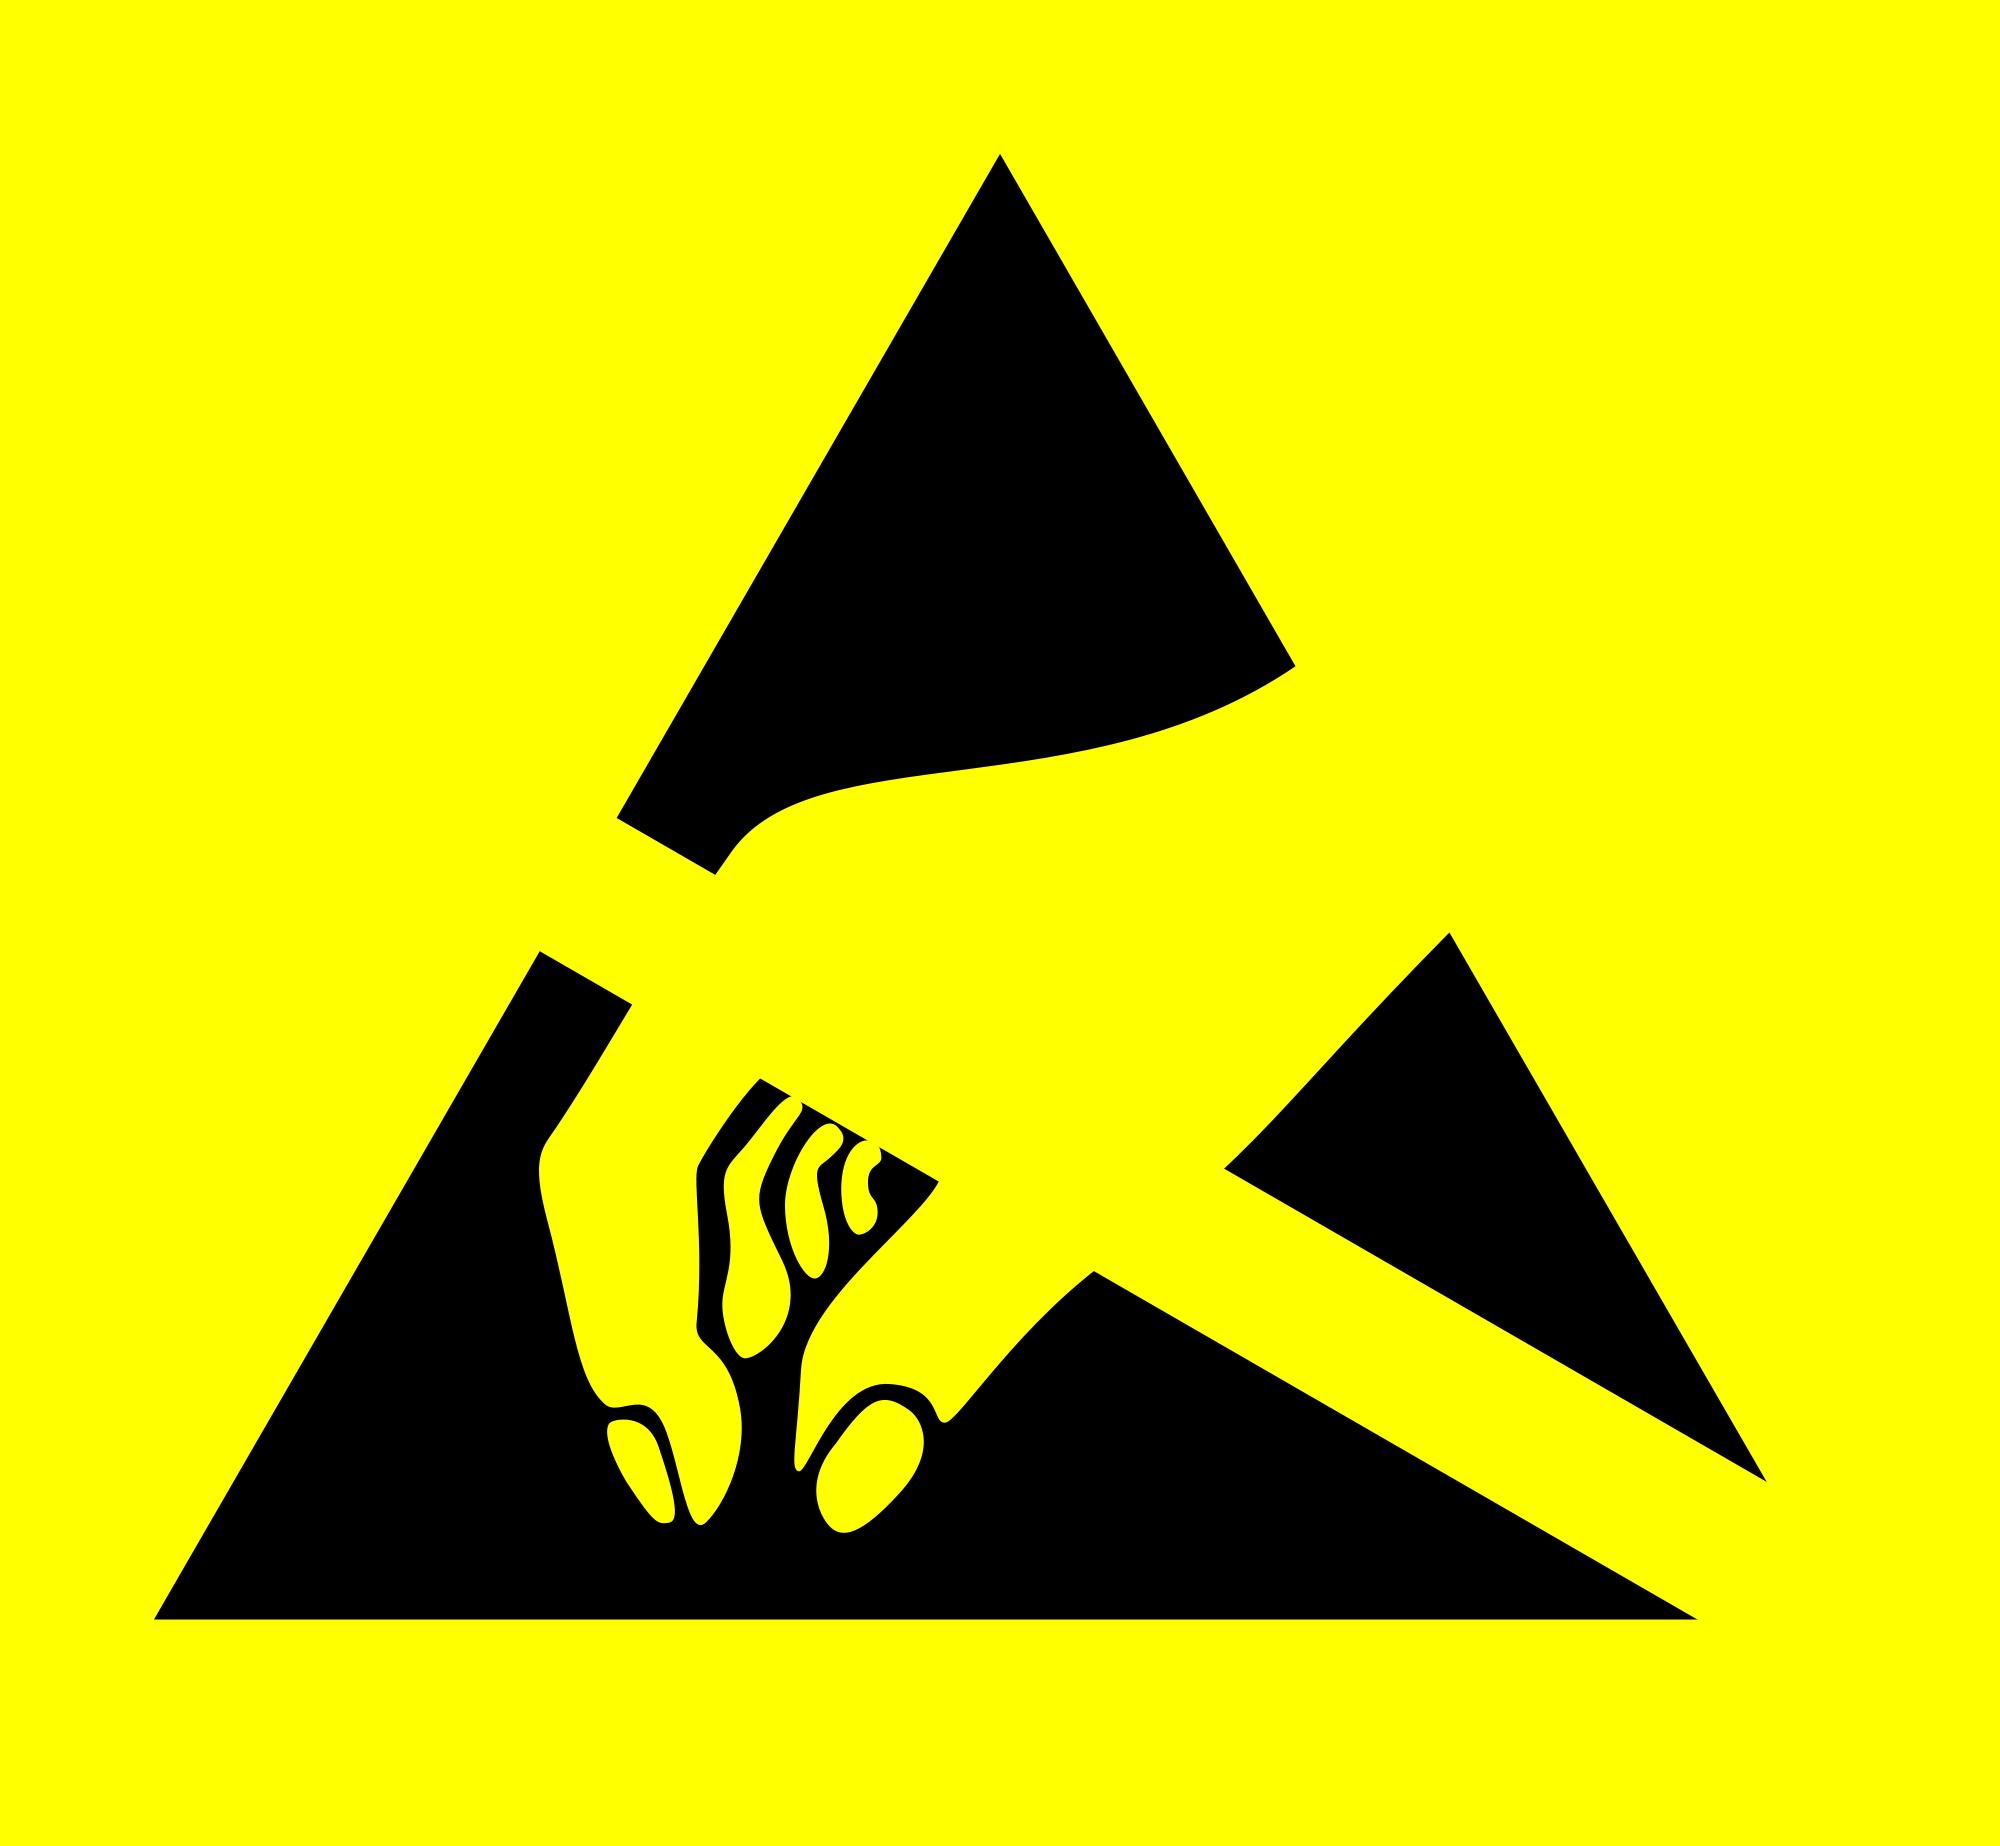 Caution ESD